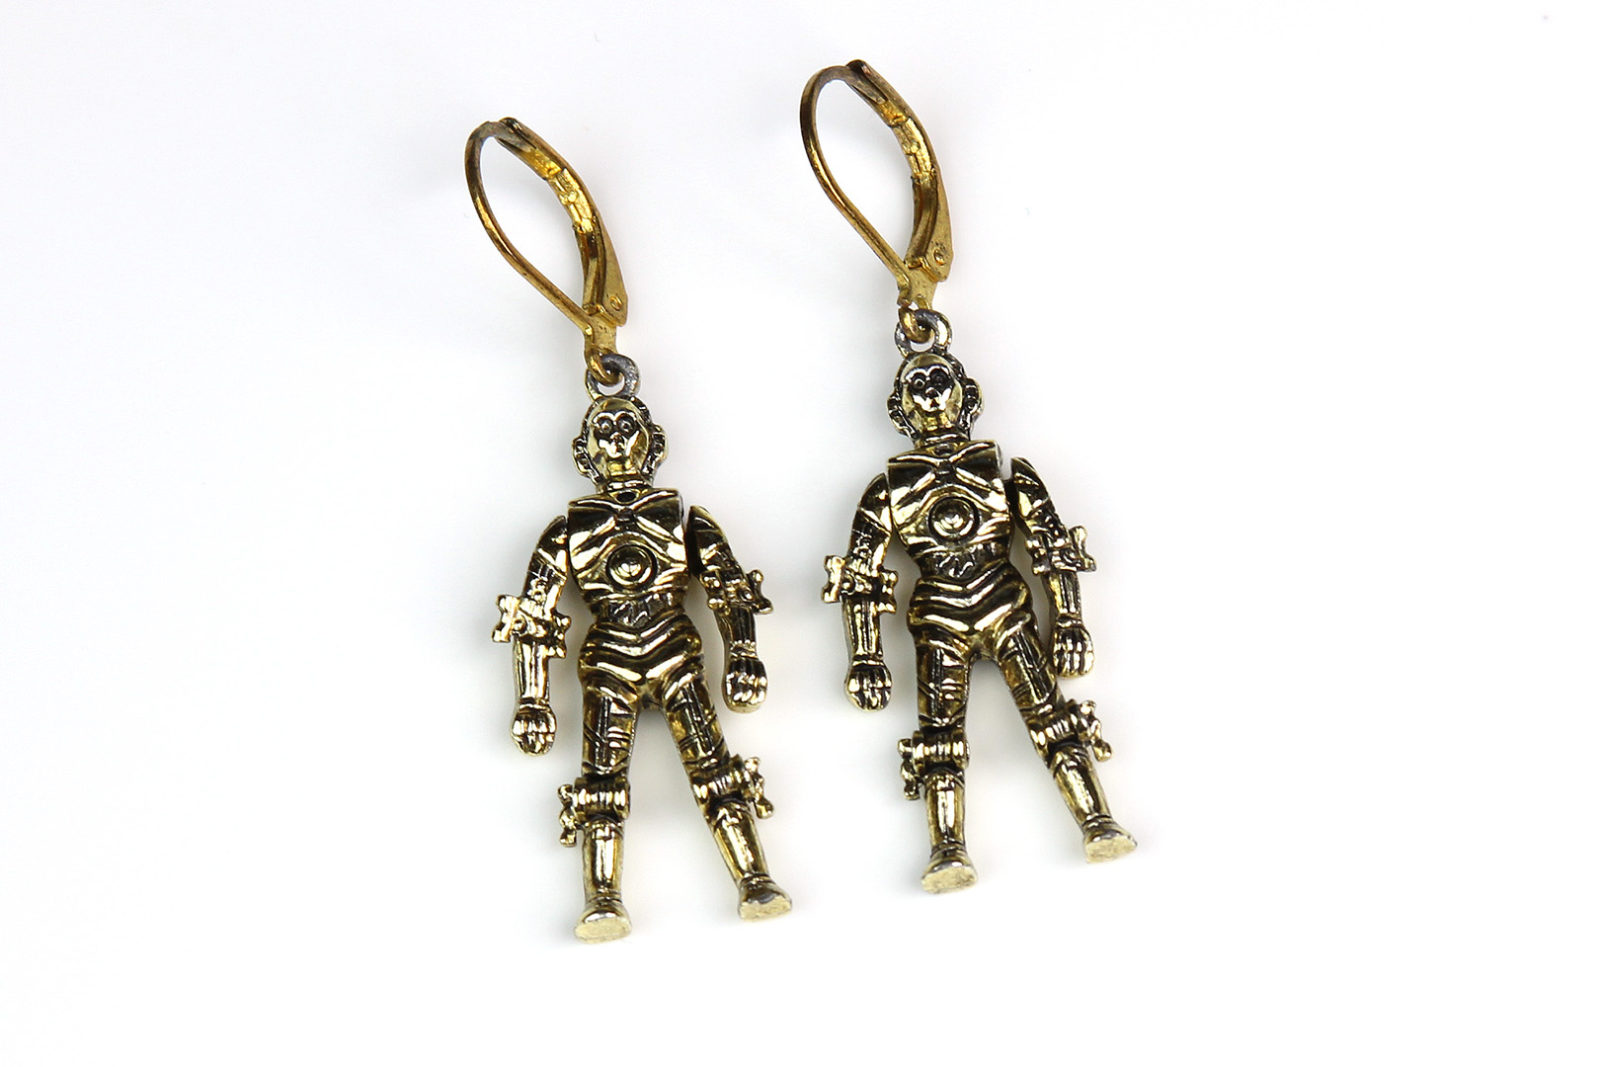 Vintage 1997 C-3PO earrings (altered)